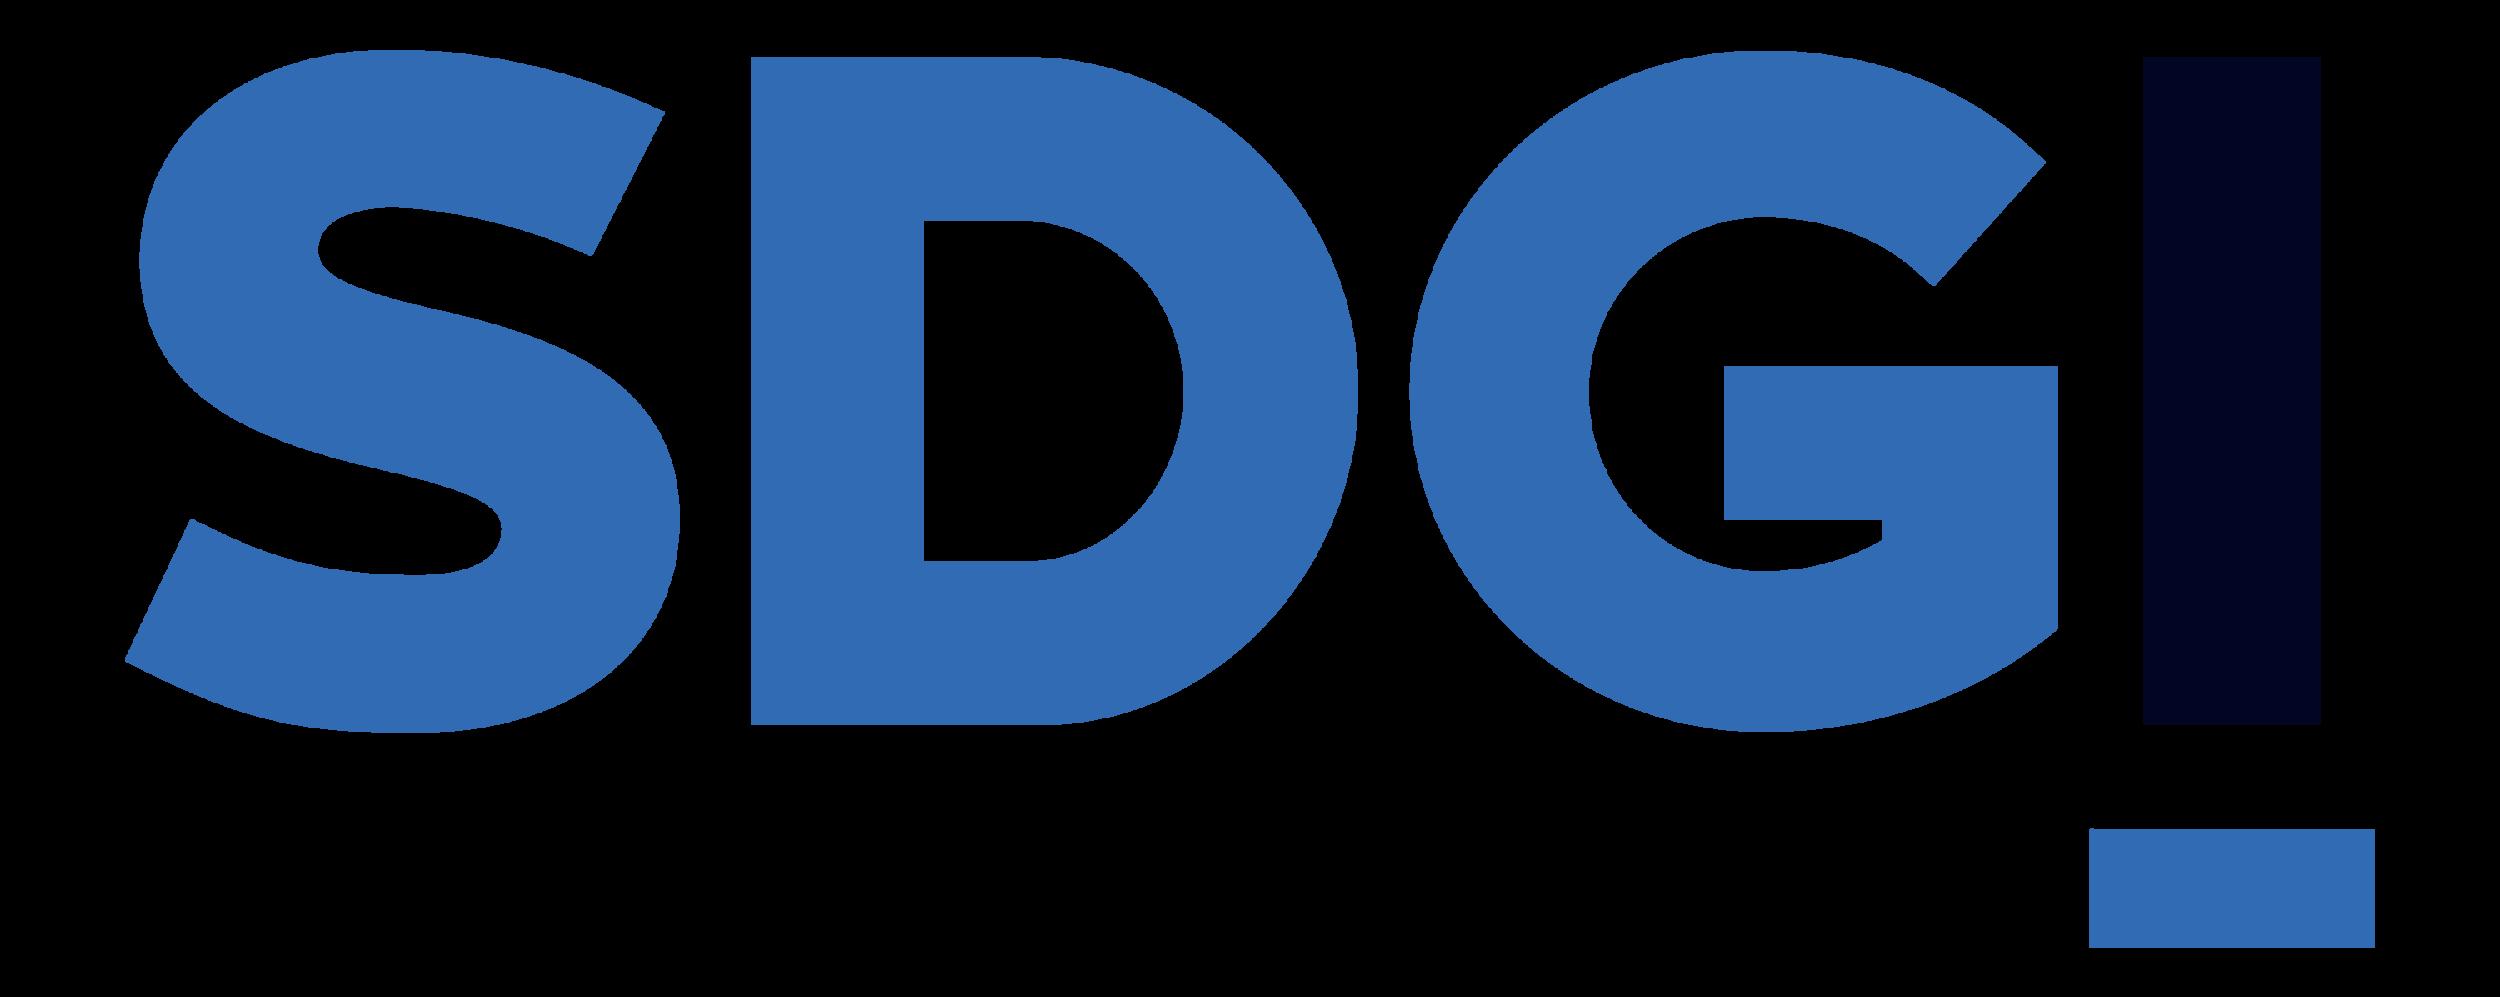 SDGI_logo.png